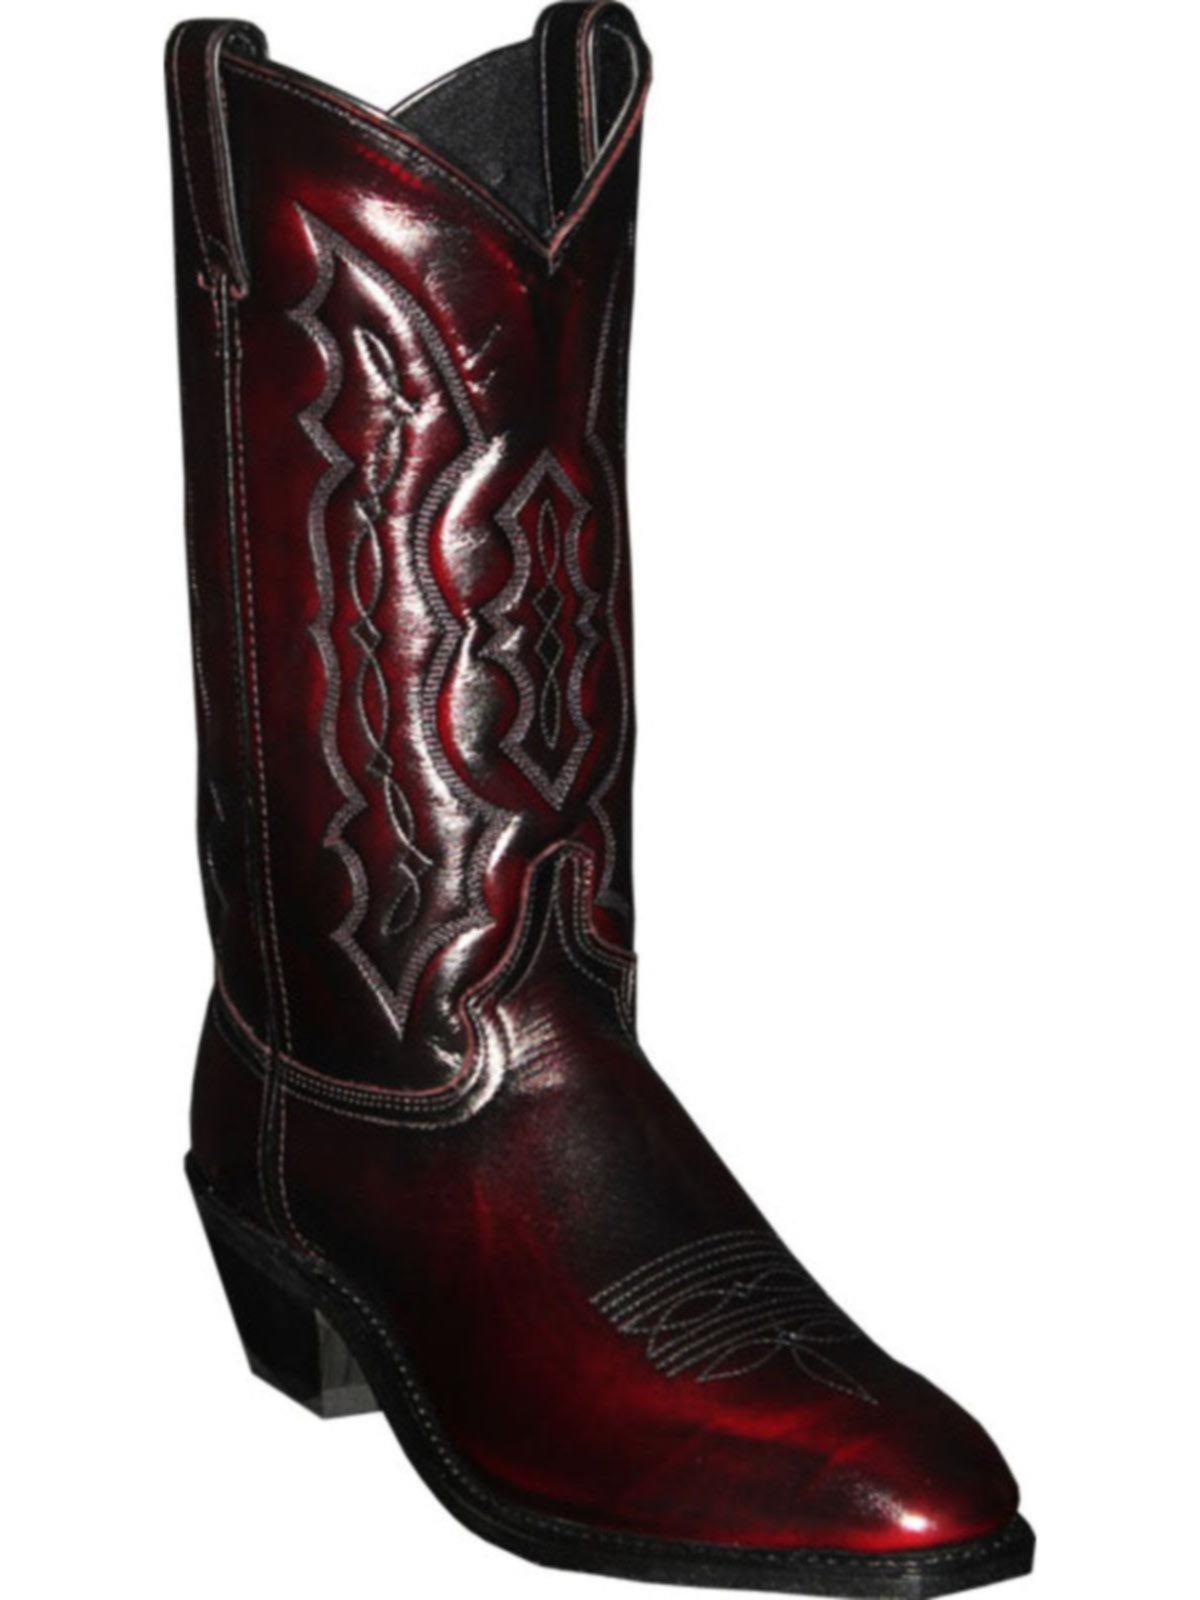 BootAmerica  Abilene Mens 12 Black Cherry Cowboy Boot 6469